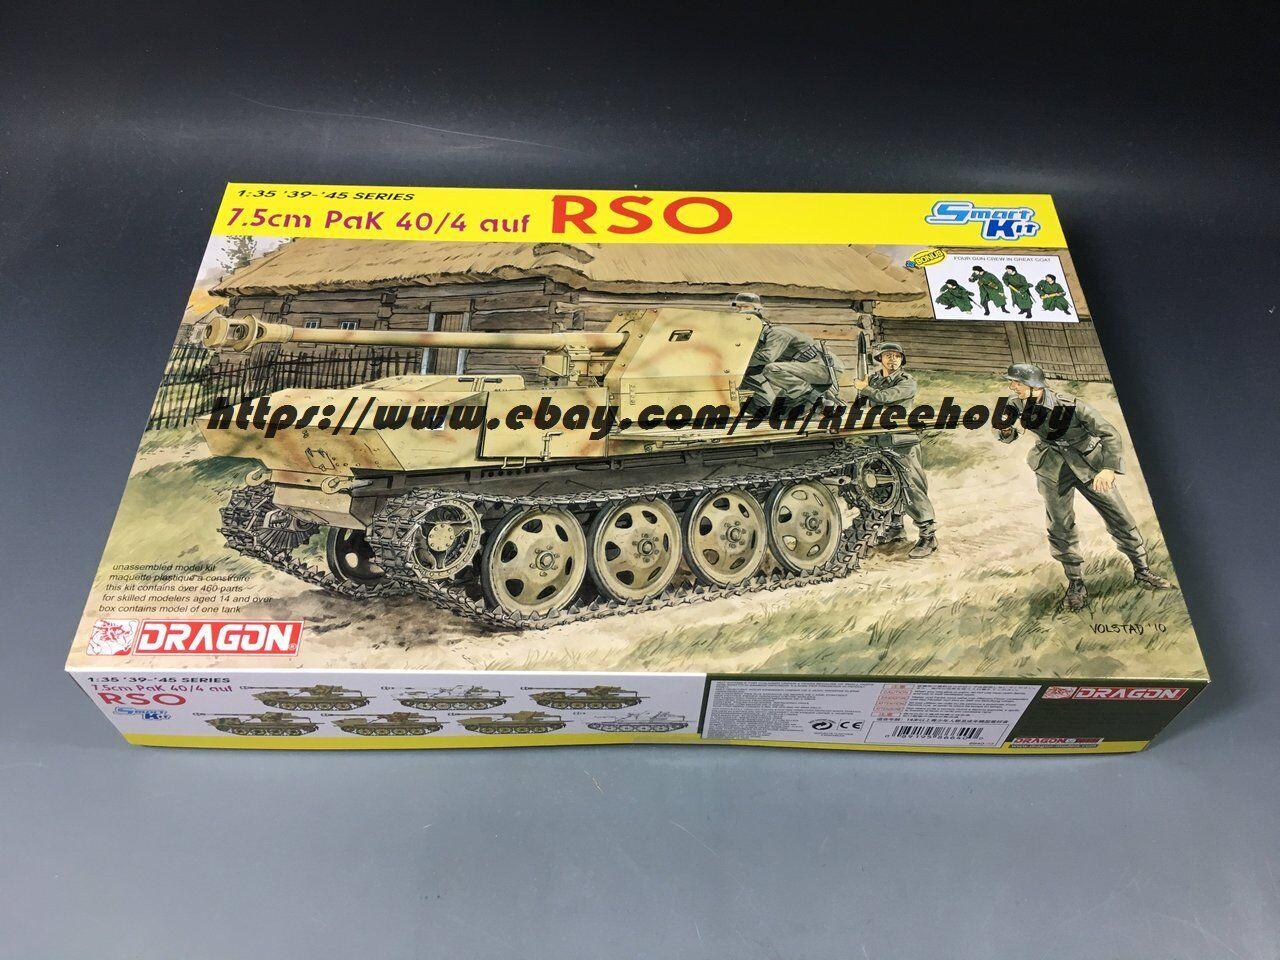 DRAGON 6640 1 35 7.5cm Pak 40 4 auf RSO